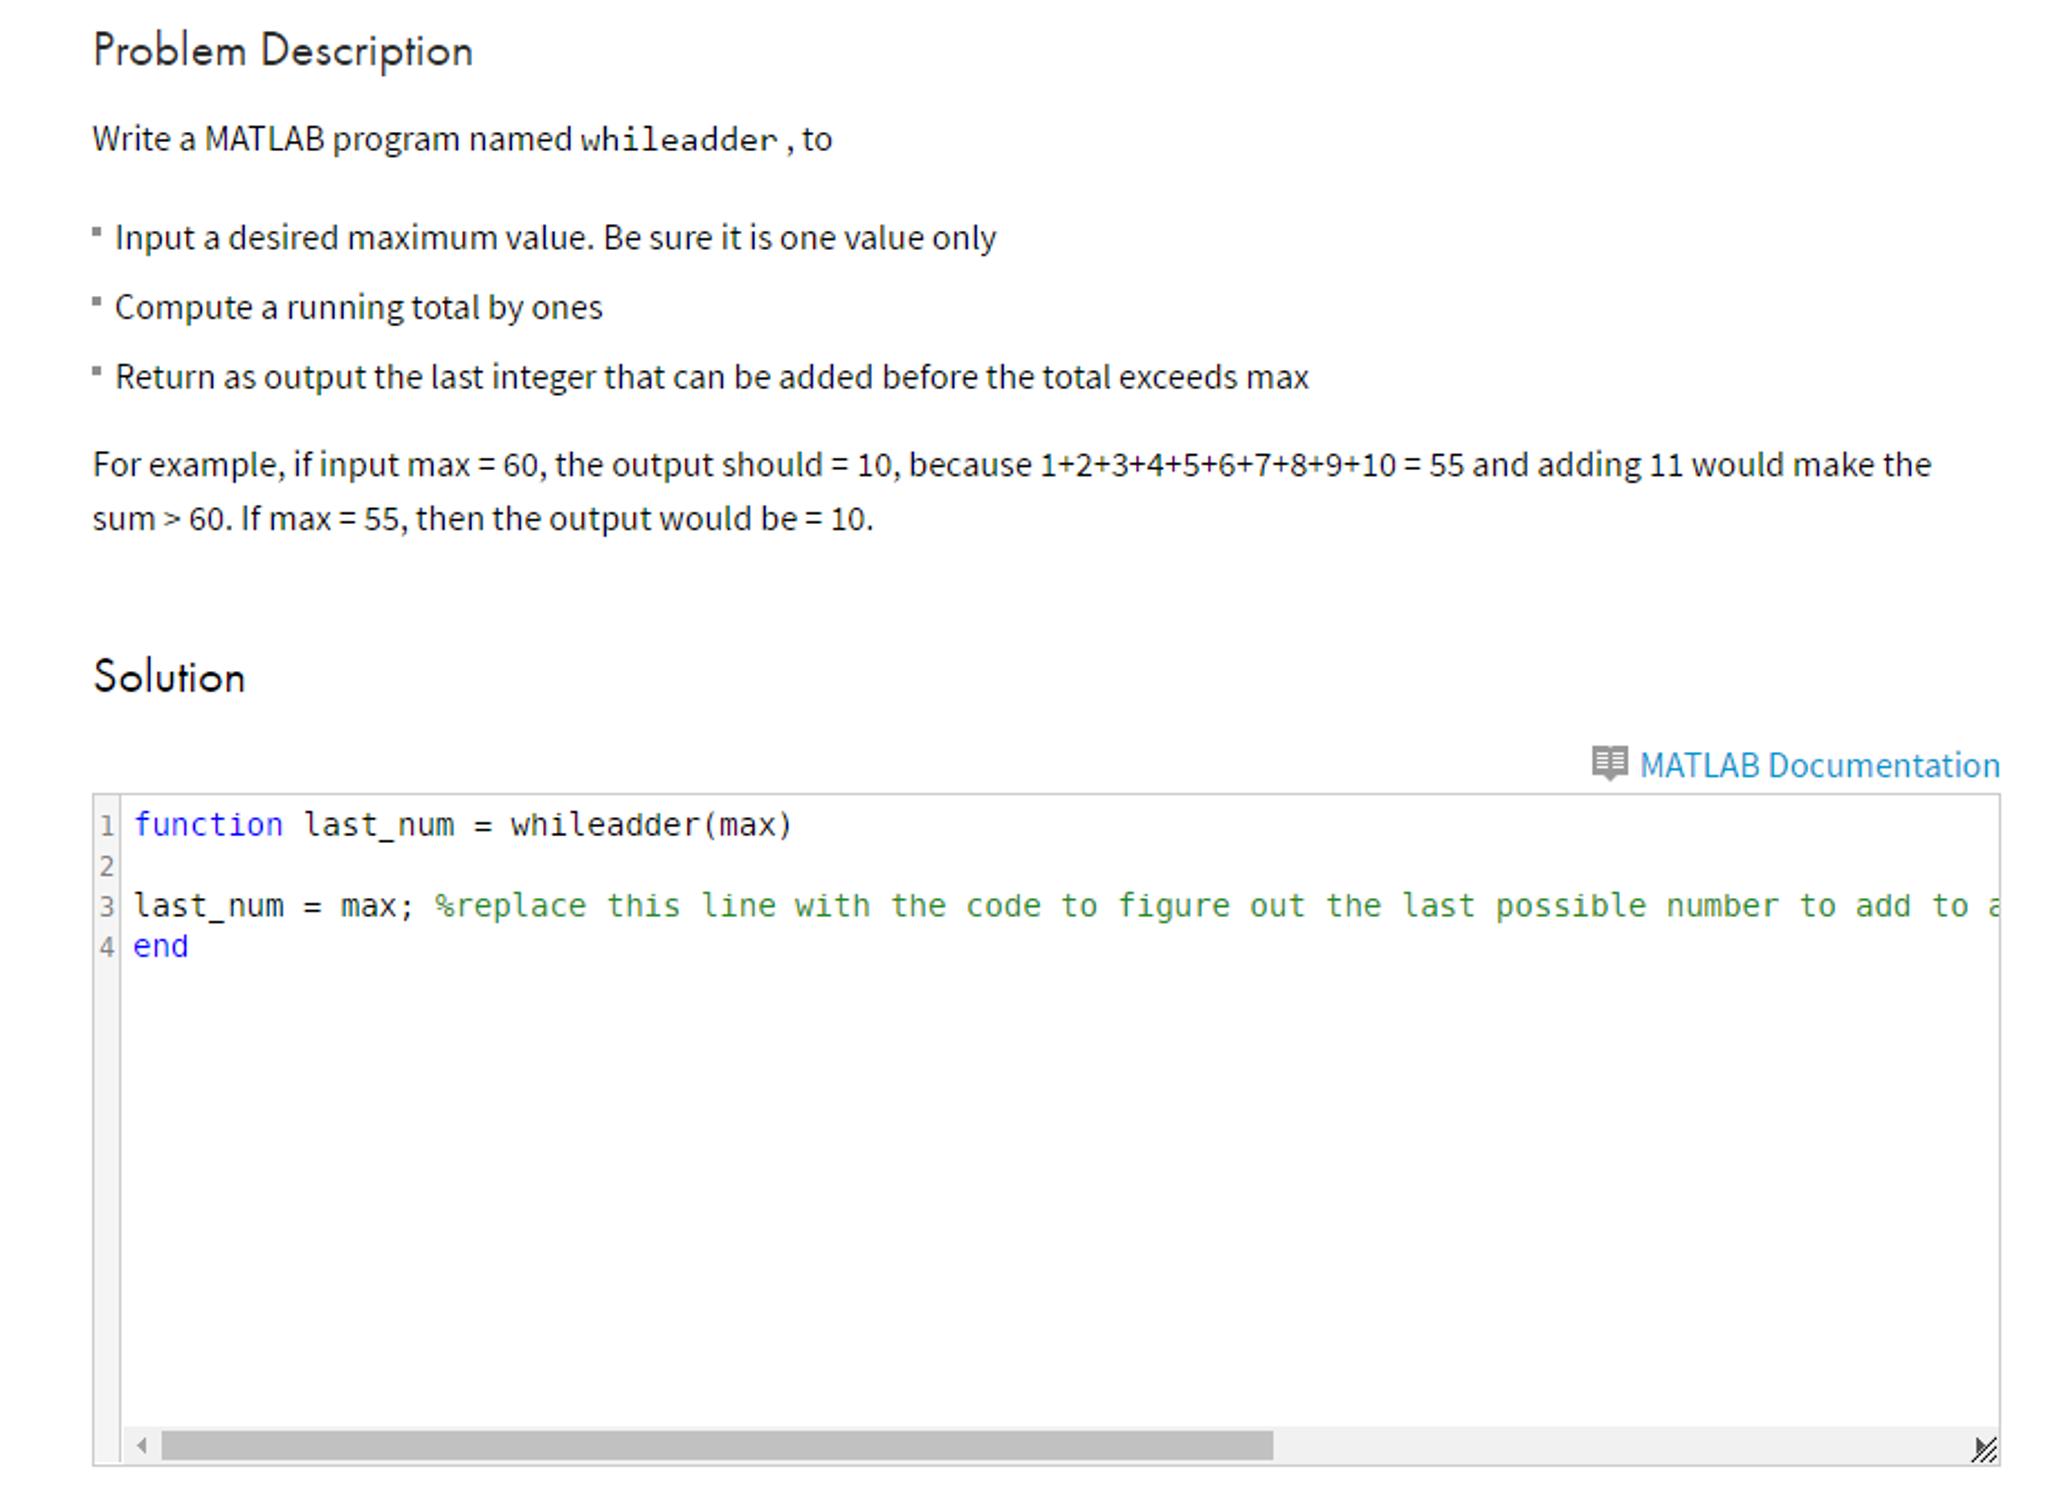 Solved: Write A MATLAB Program Named Whileadder, To Input